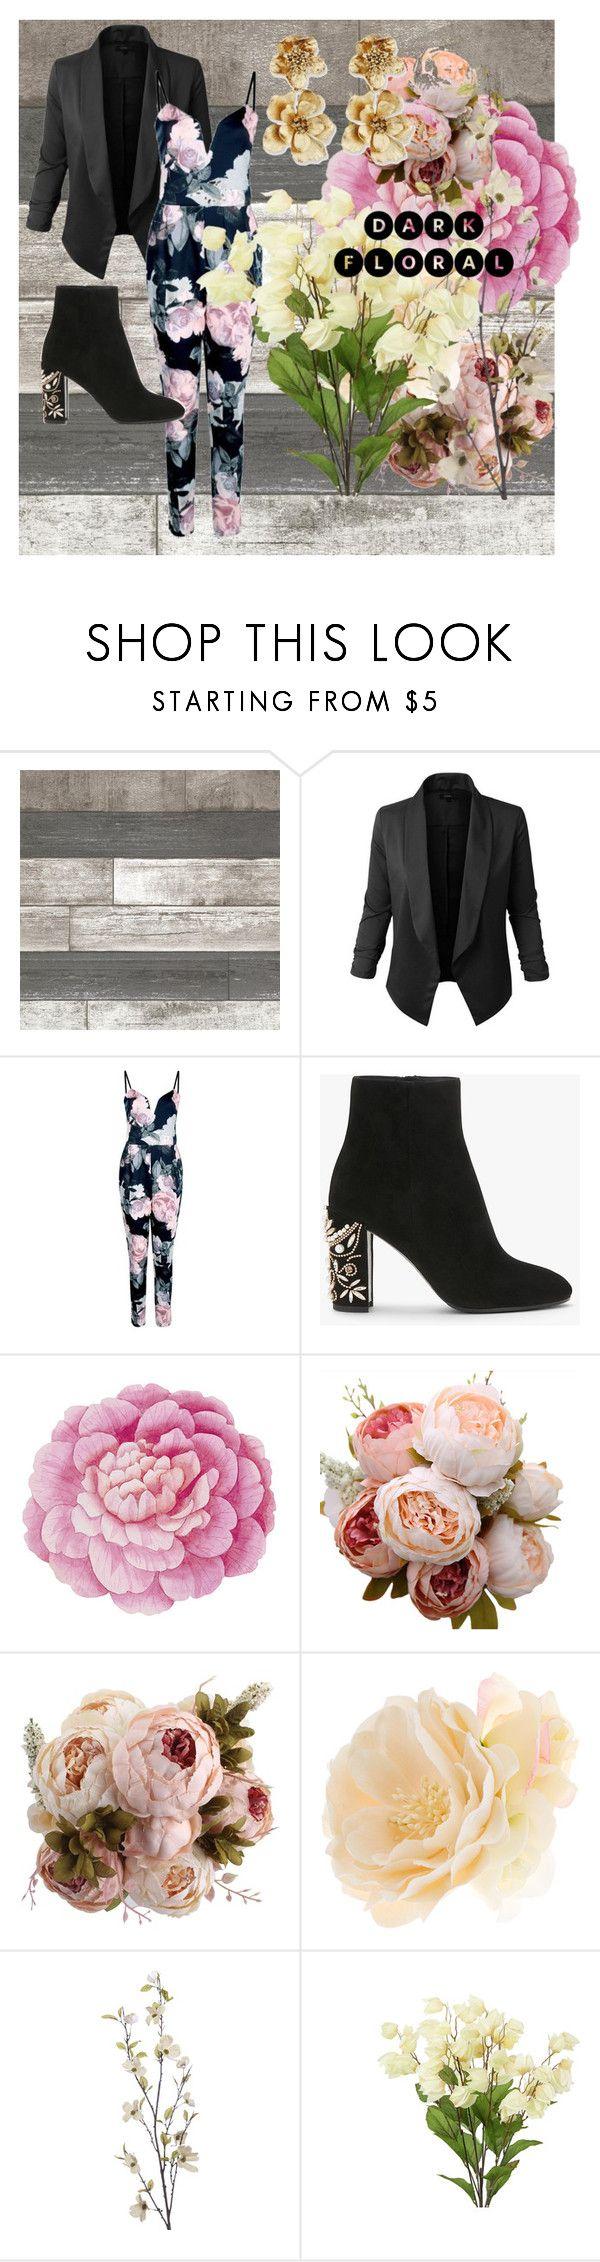 """Dark Floral"" by glitterunicorn13 ❤ liked on Polyvore featuring Jupe de Abby, Boohoo, Ballard Designs, Accessorize, Pier 1 Imports and Oscar de la Renta"